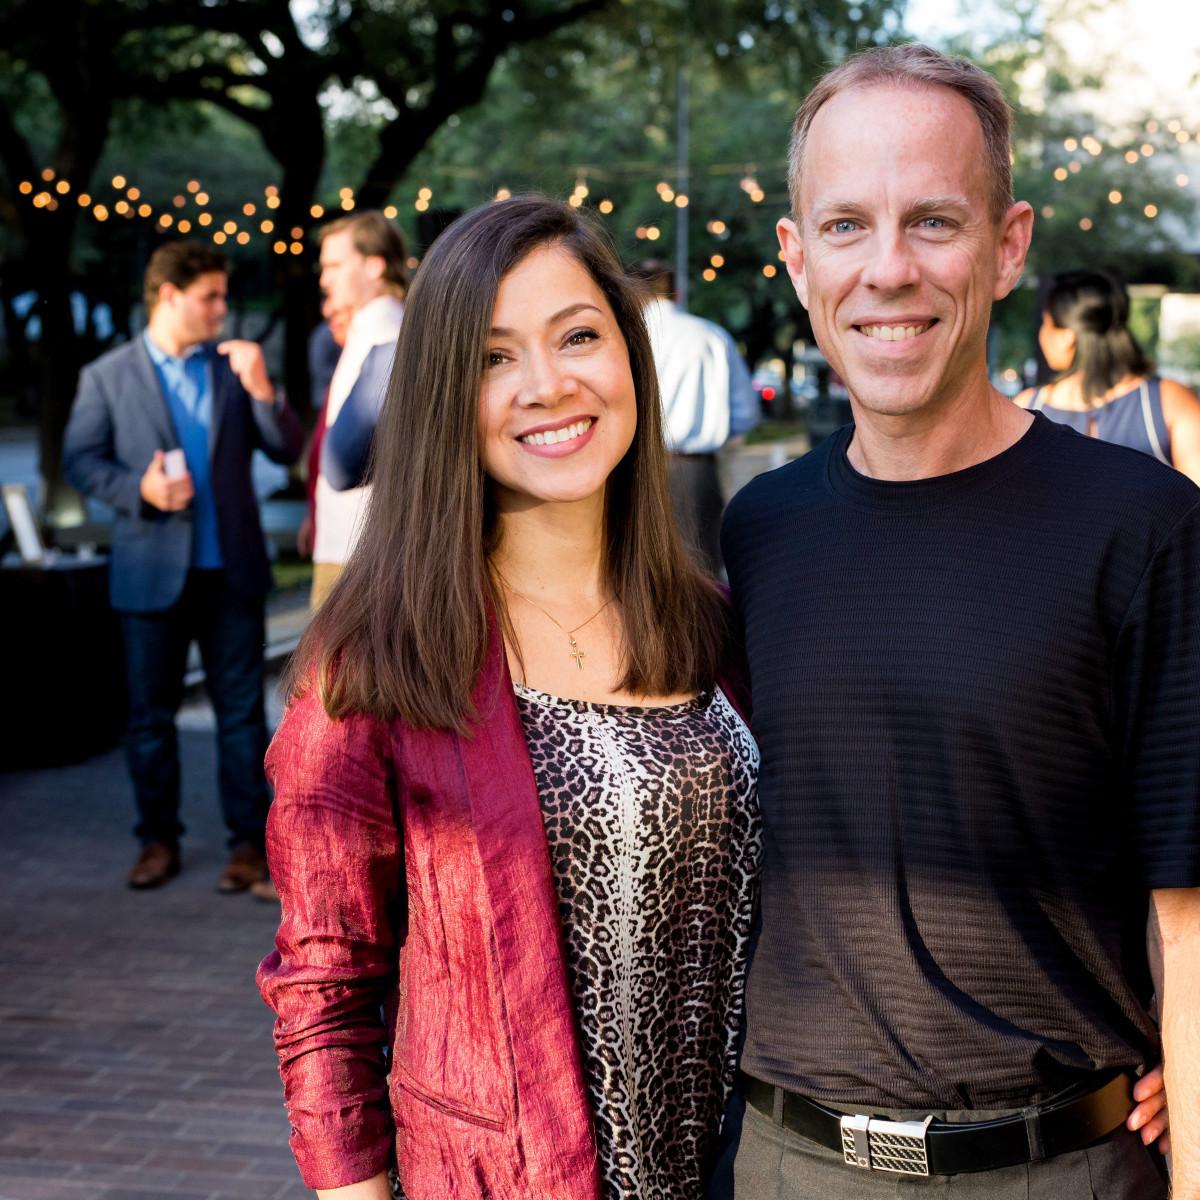 Houston, SportsMap launch party, October 2017, Anna Navaro, Charlie Pallilo